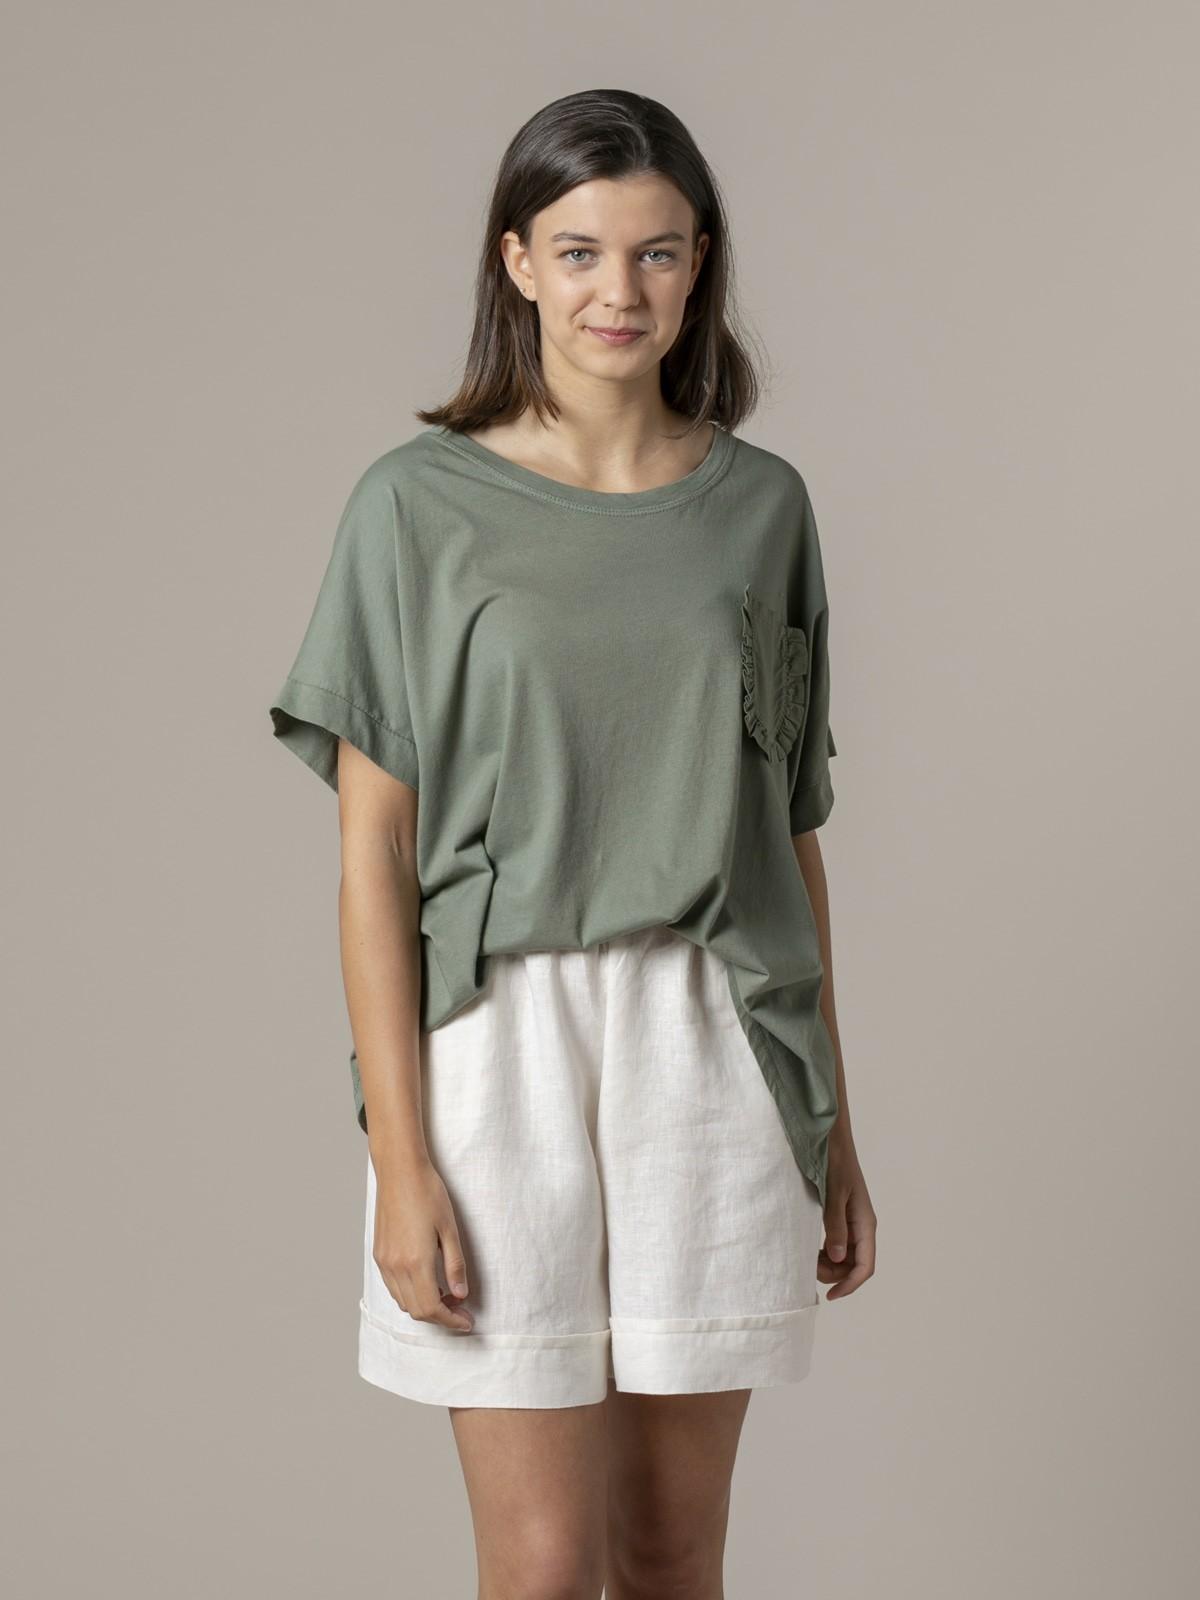 Camiseta mujer bolsillo especial Caqui